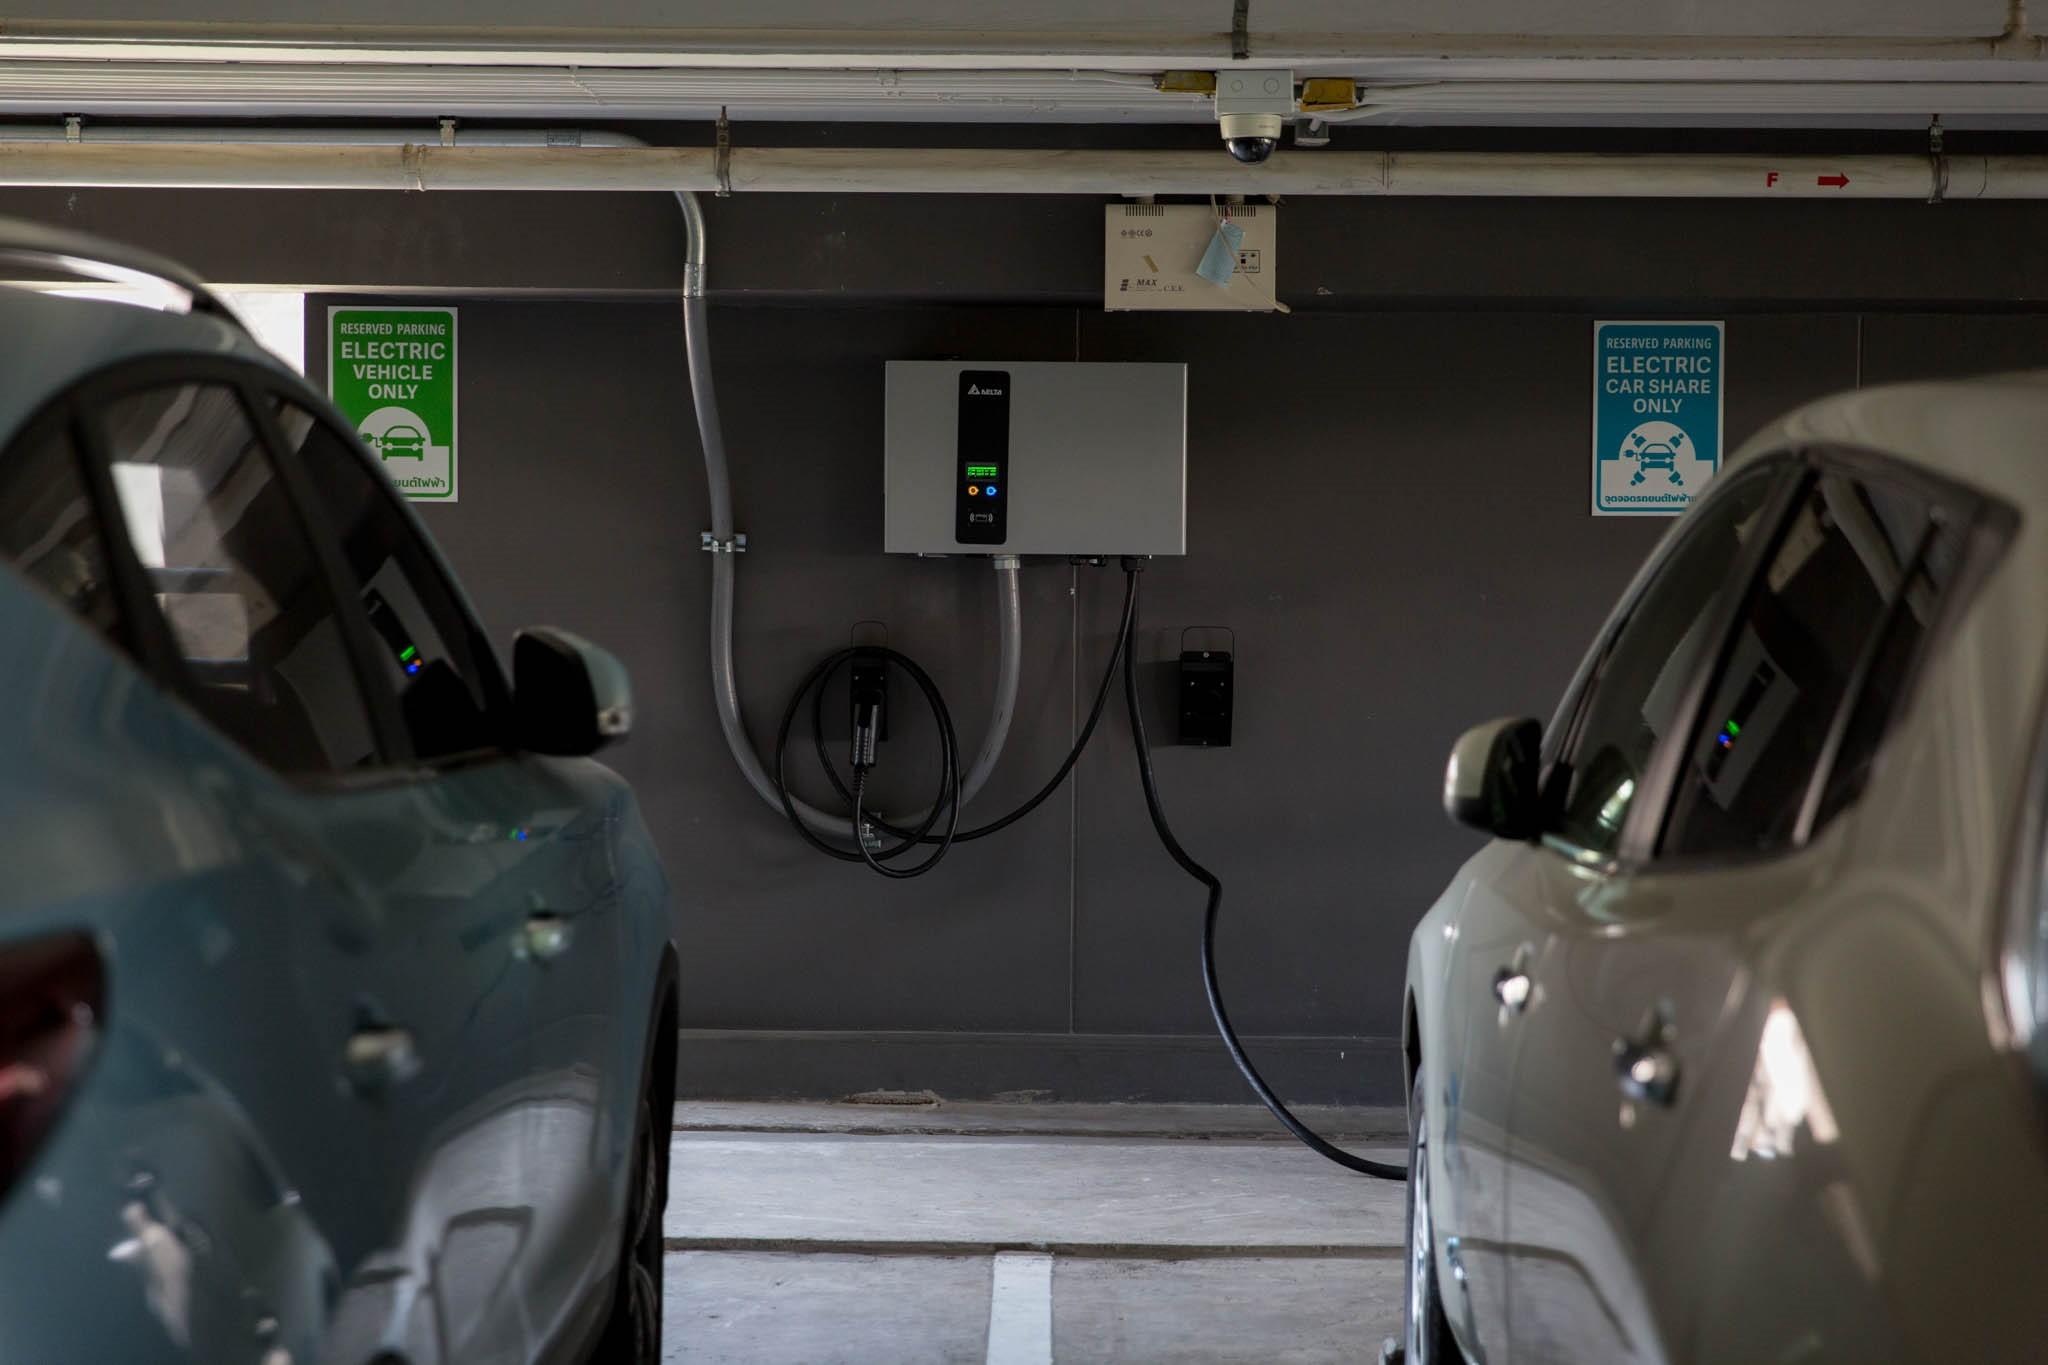 Delta's charging solution